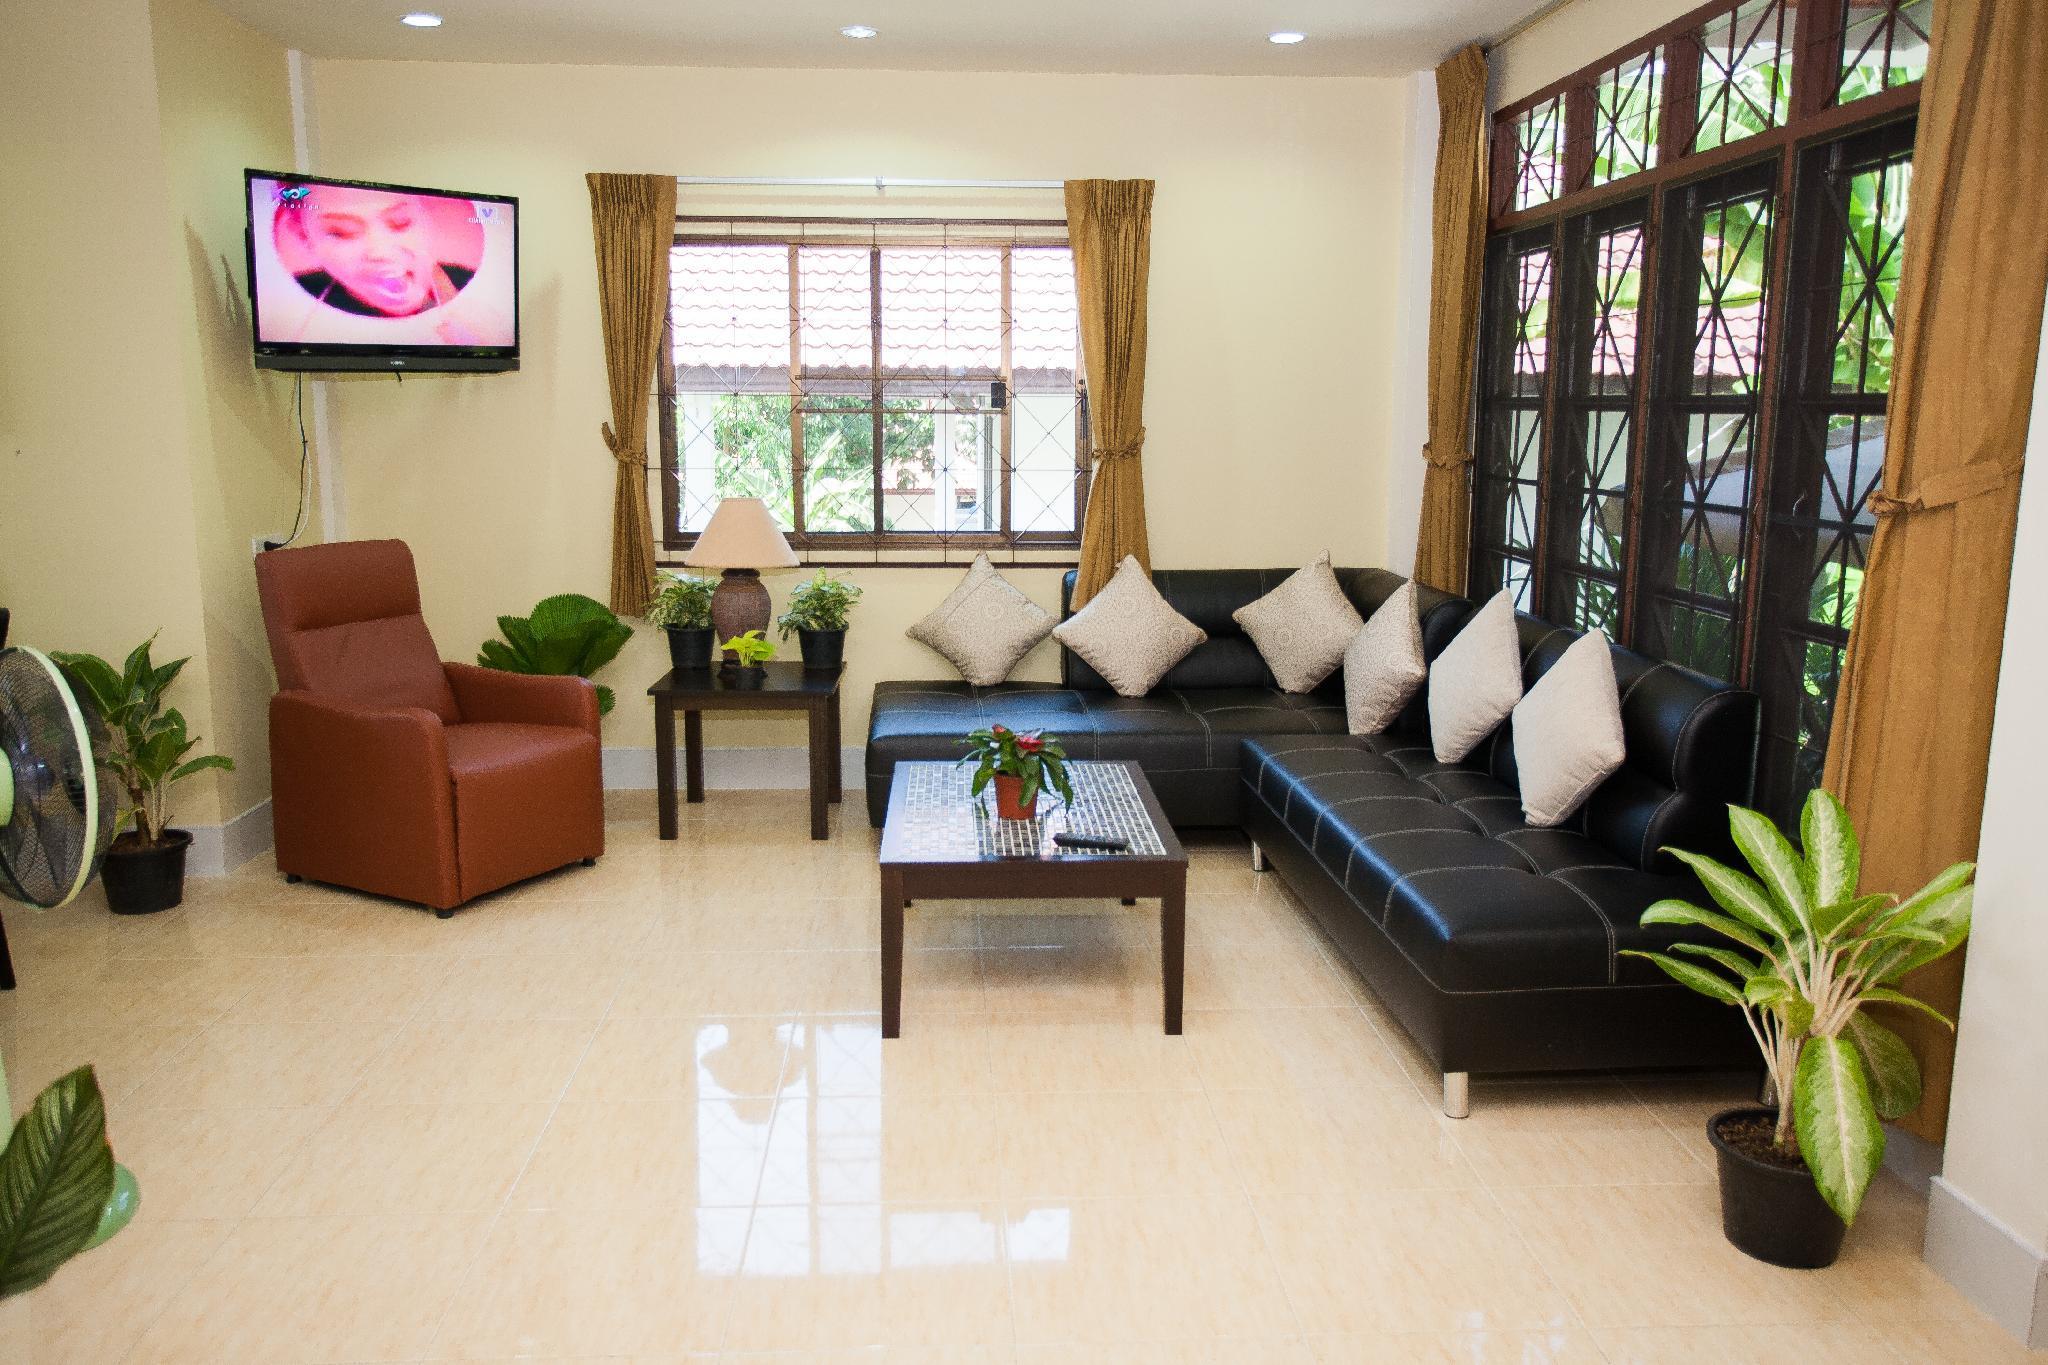 Veerakit House   Private Holiday Home   Sleeps 10